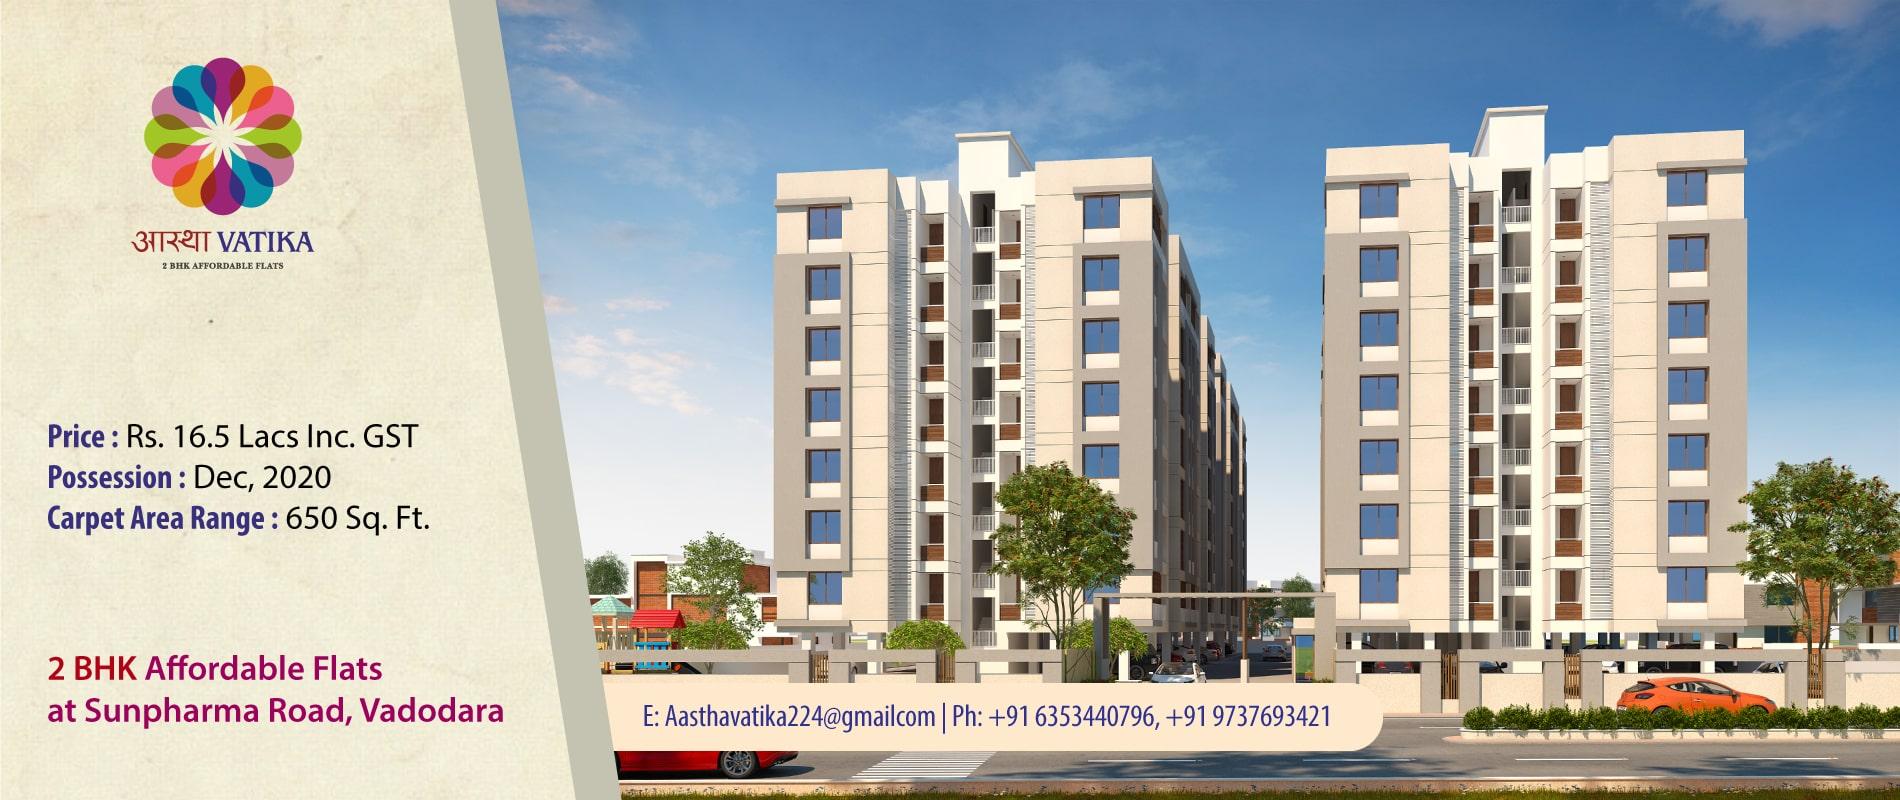 2 BHK Affordable Flats at Sunpharma Road Vadodara